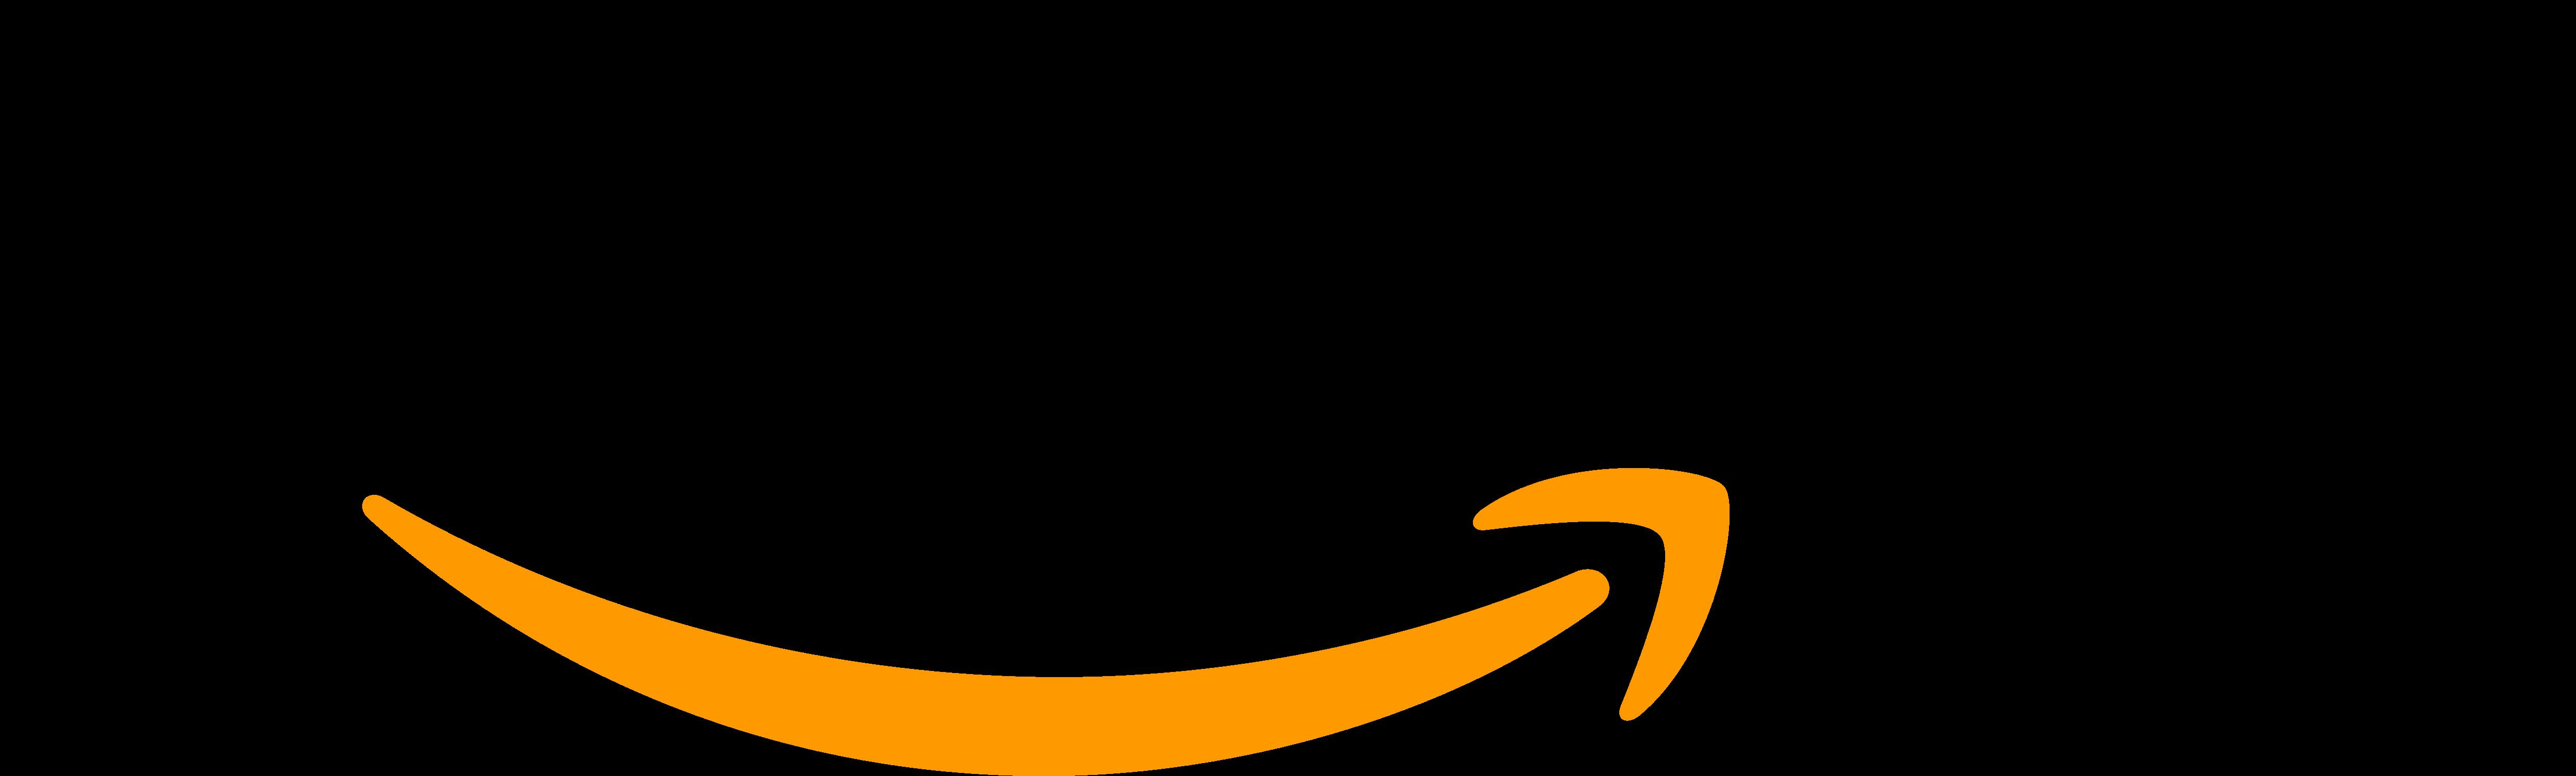 Amazon – Logos Download